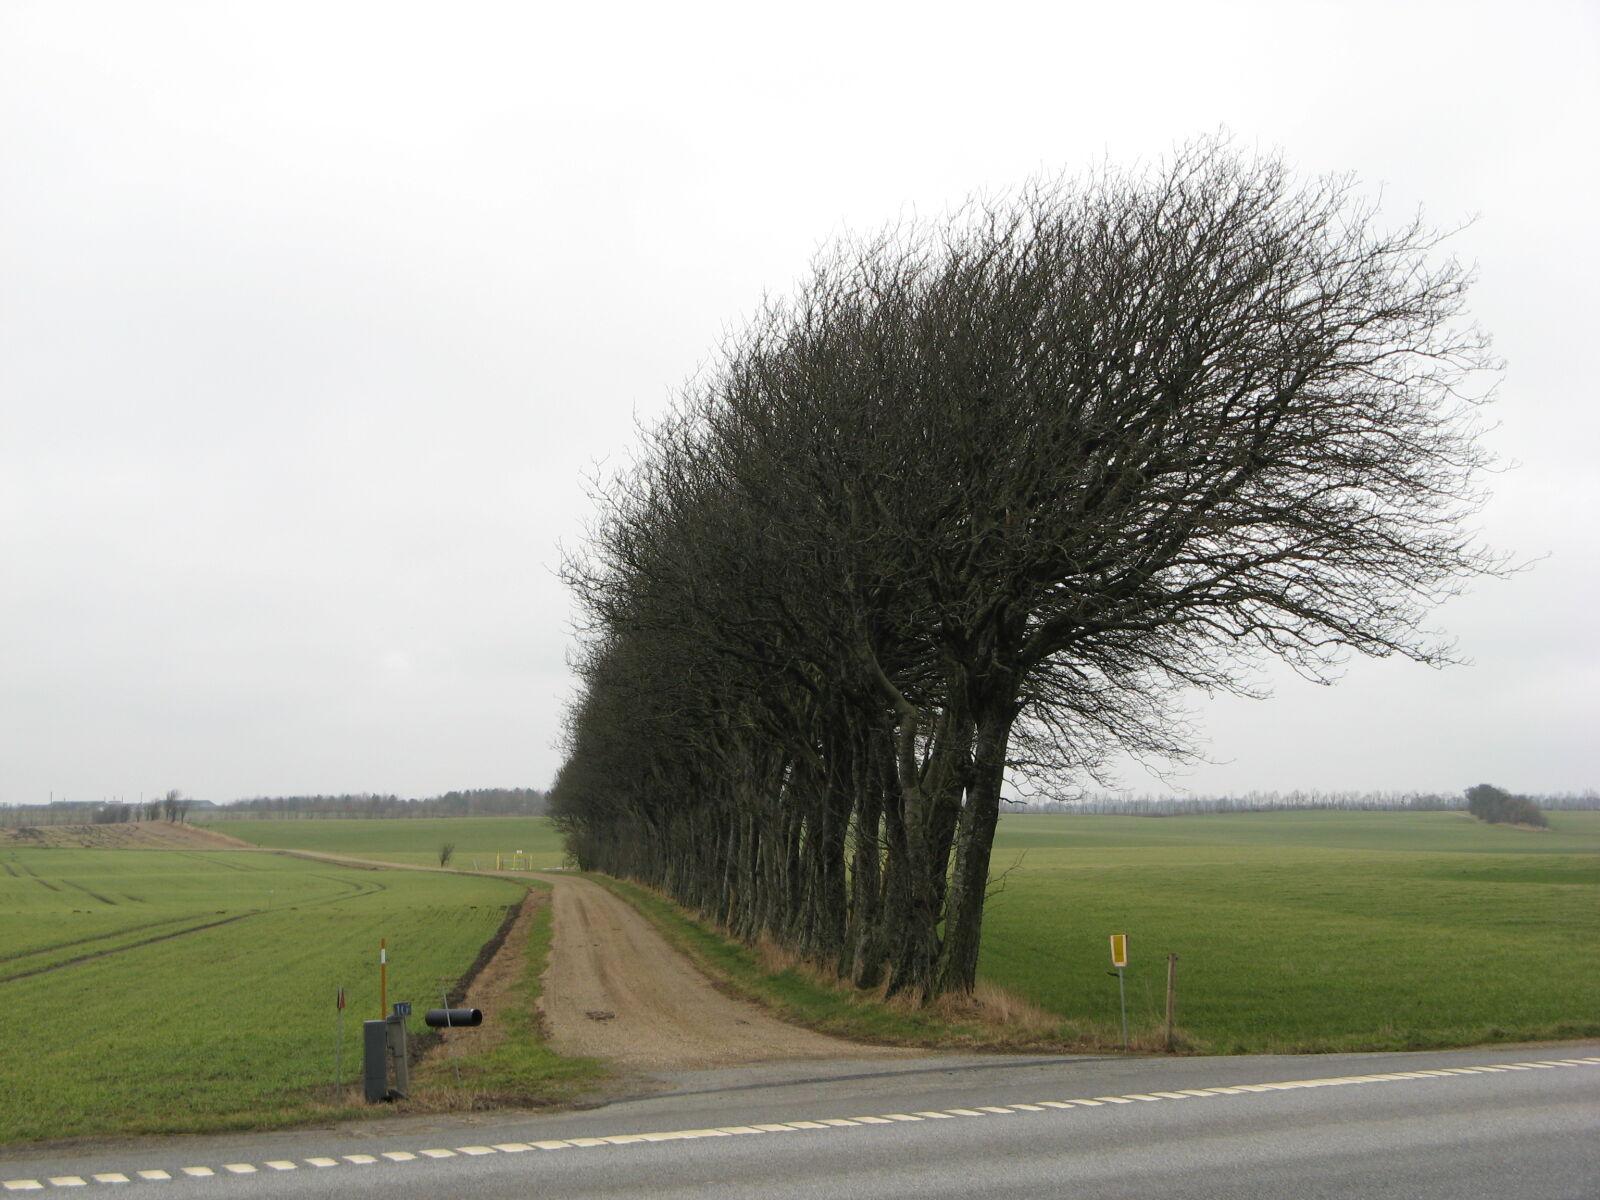 agriculture, asphalt, countryside, empty